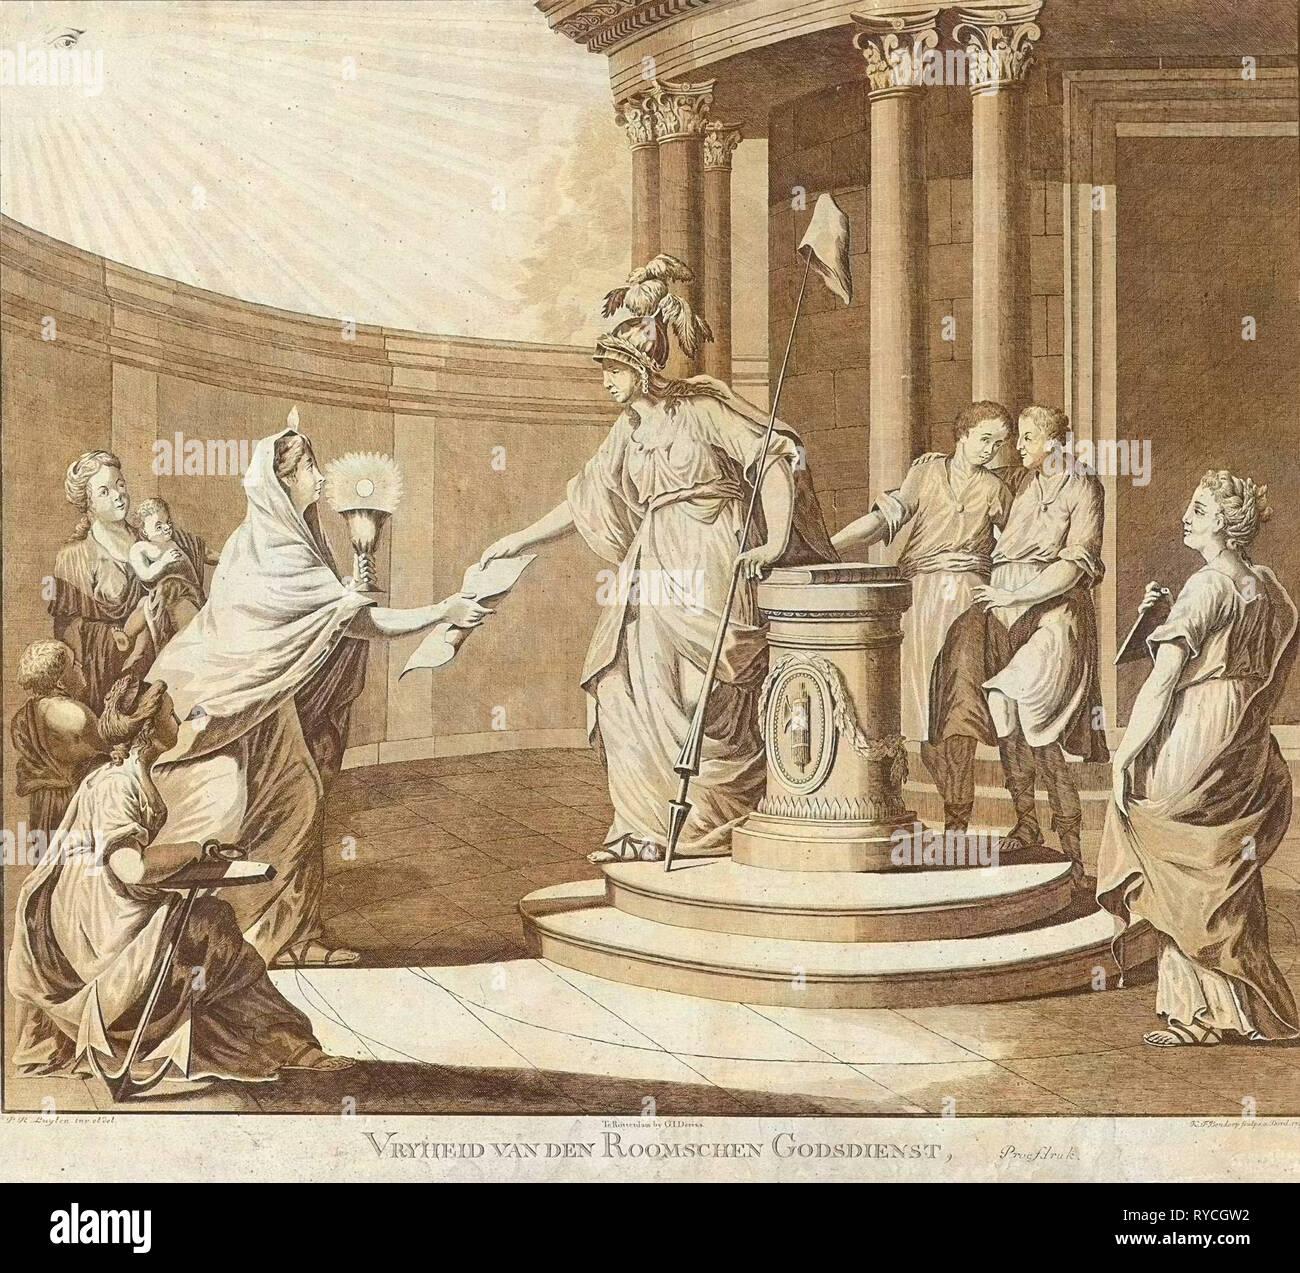 Allegory equating the Roman Catholic religion with other denominations, 1799, print maker: Carel Frederik Bendorp I, Pieter Luyten, G.J. Derens, 1799 - Stock Image